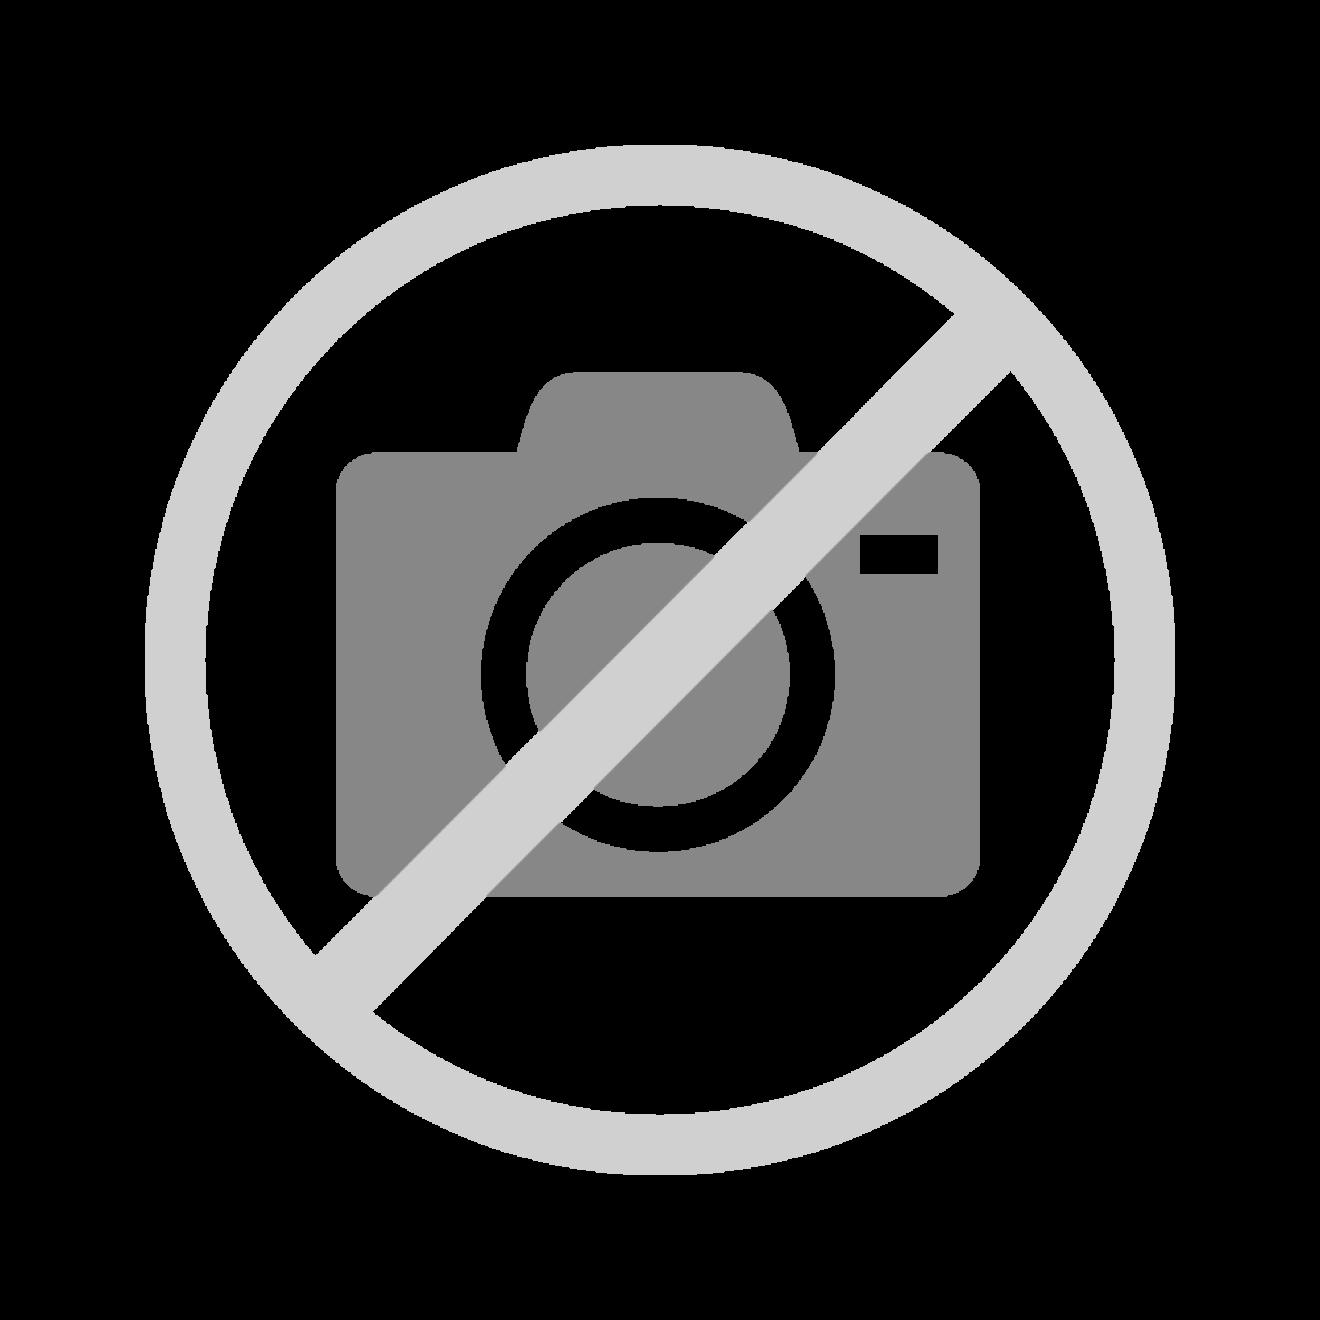 Original Larson Boat Parts and Accessories Online